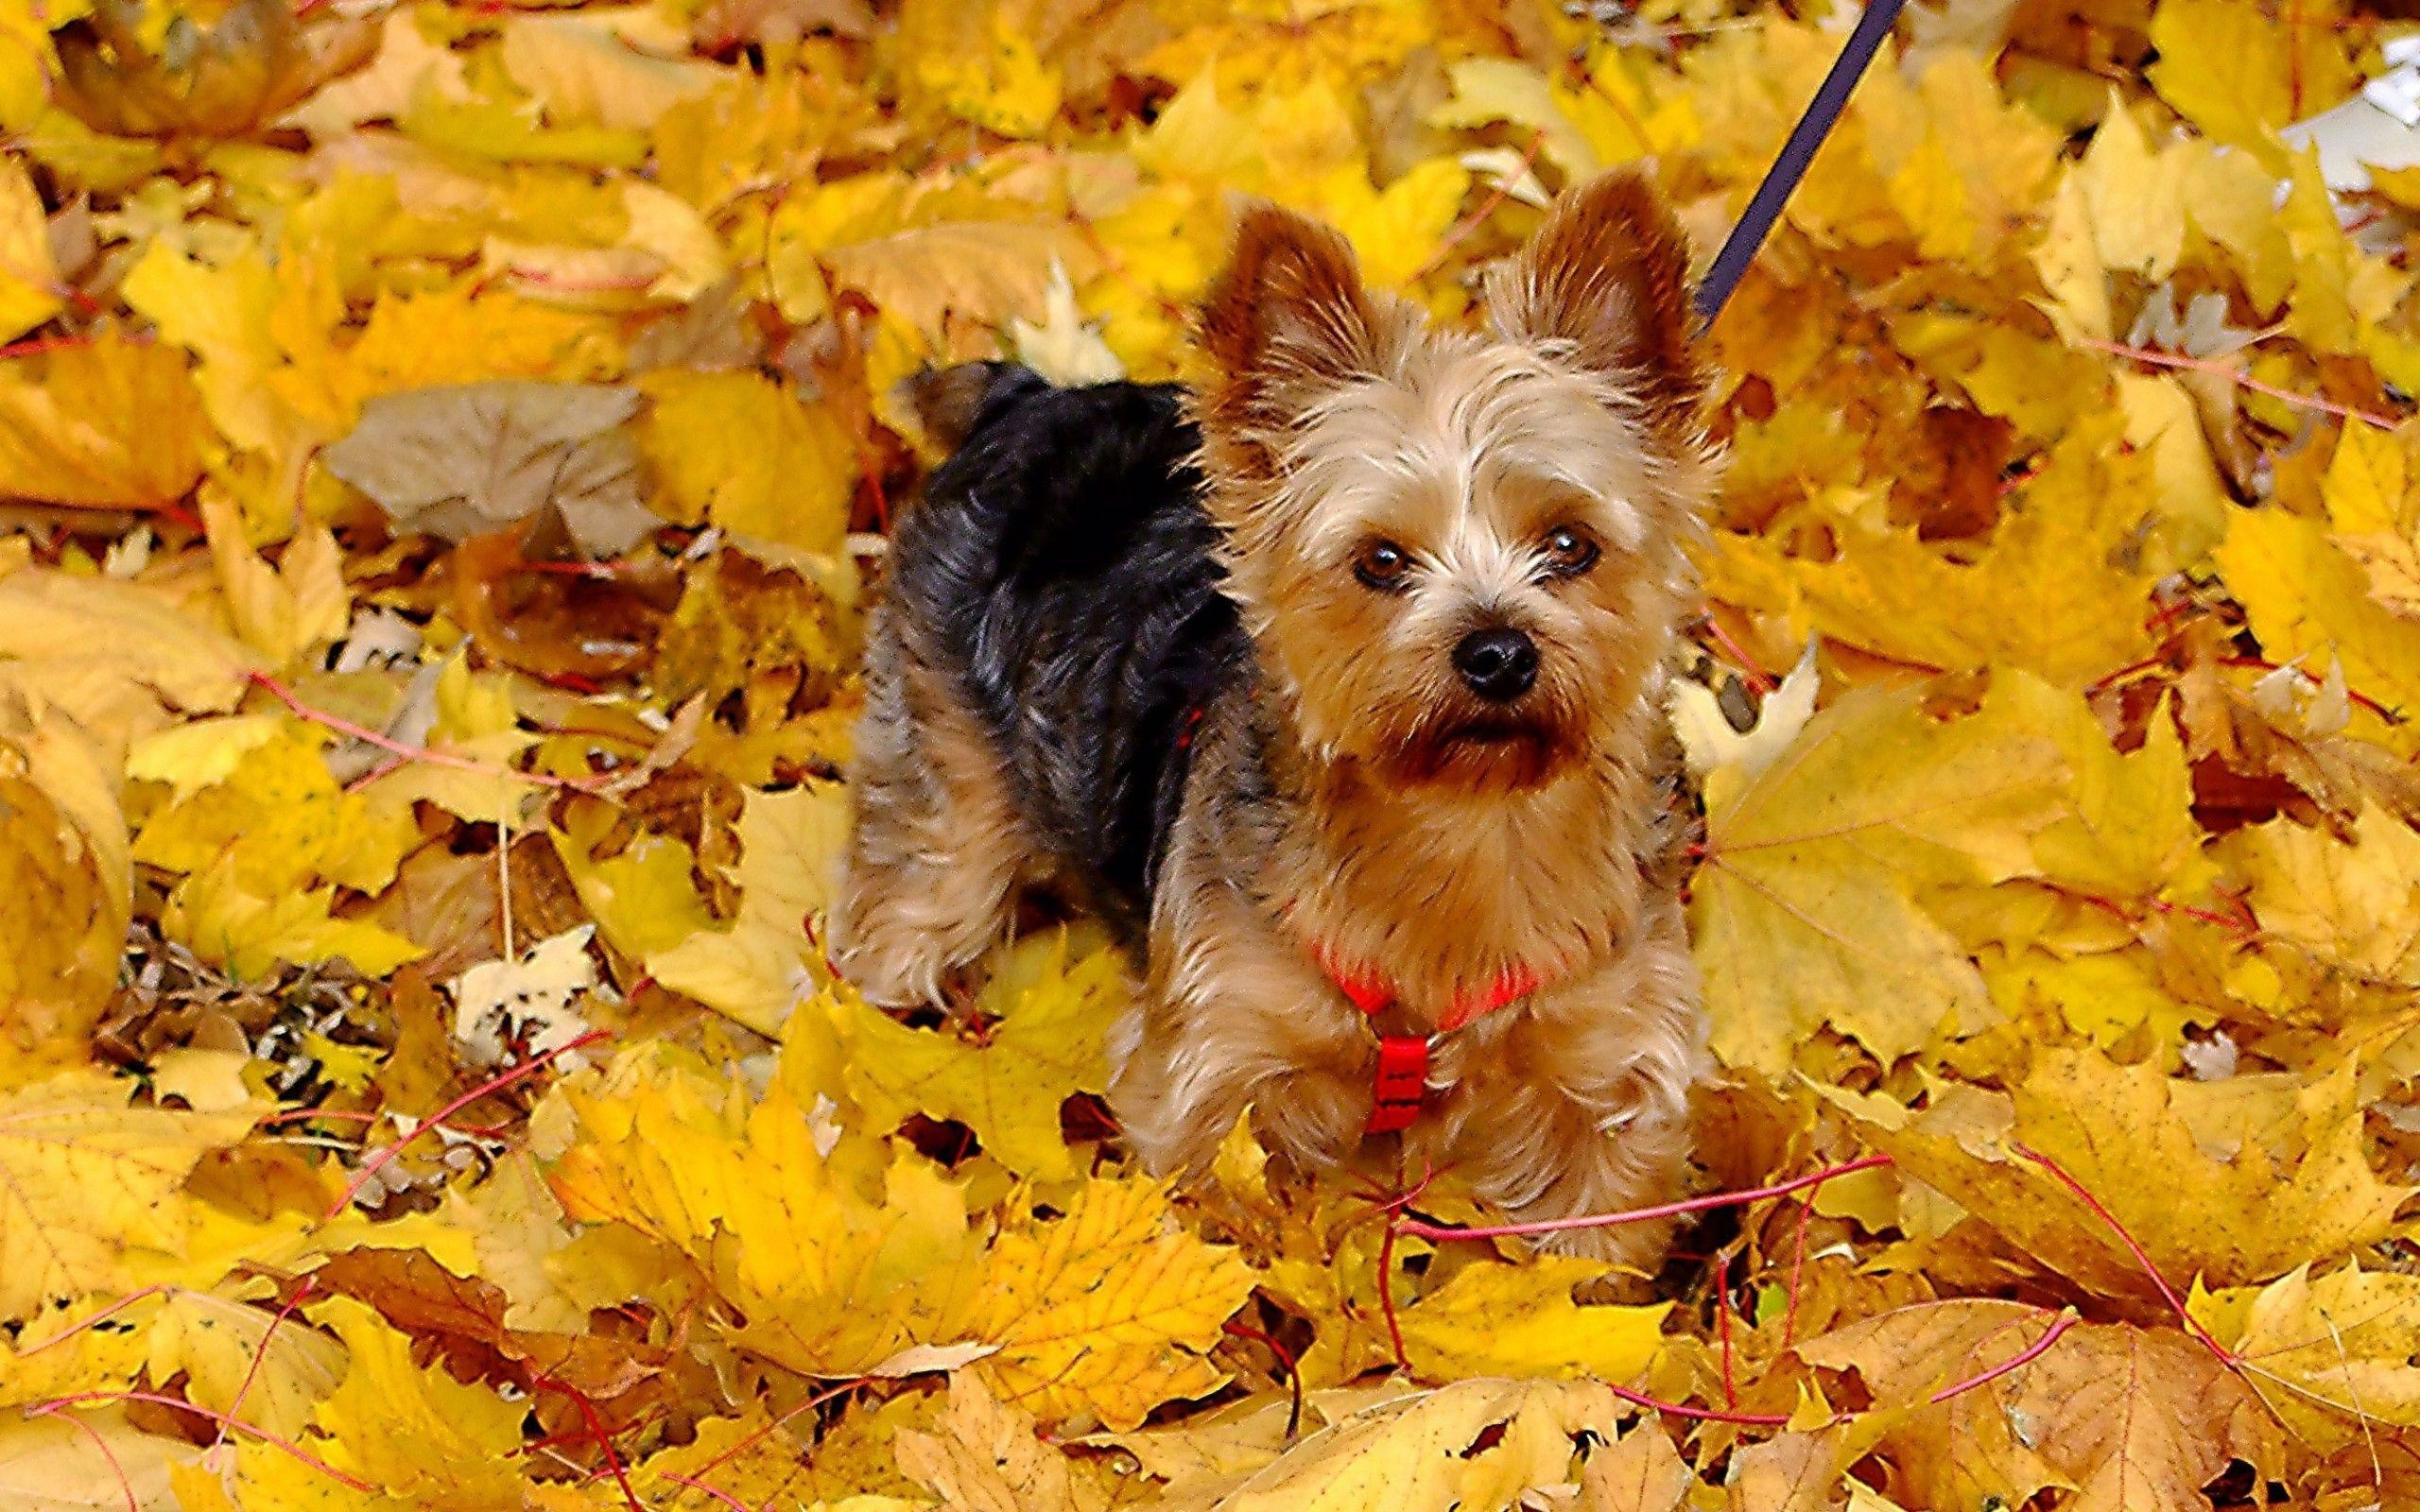 Free Desktop Wallpaper Yorkie Puppies – The Cutest Puppies